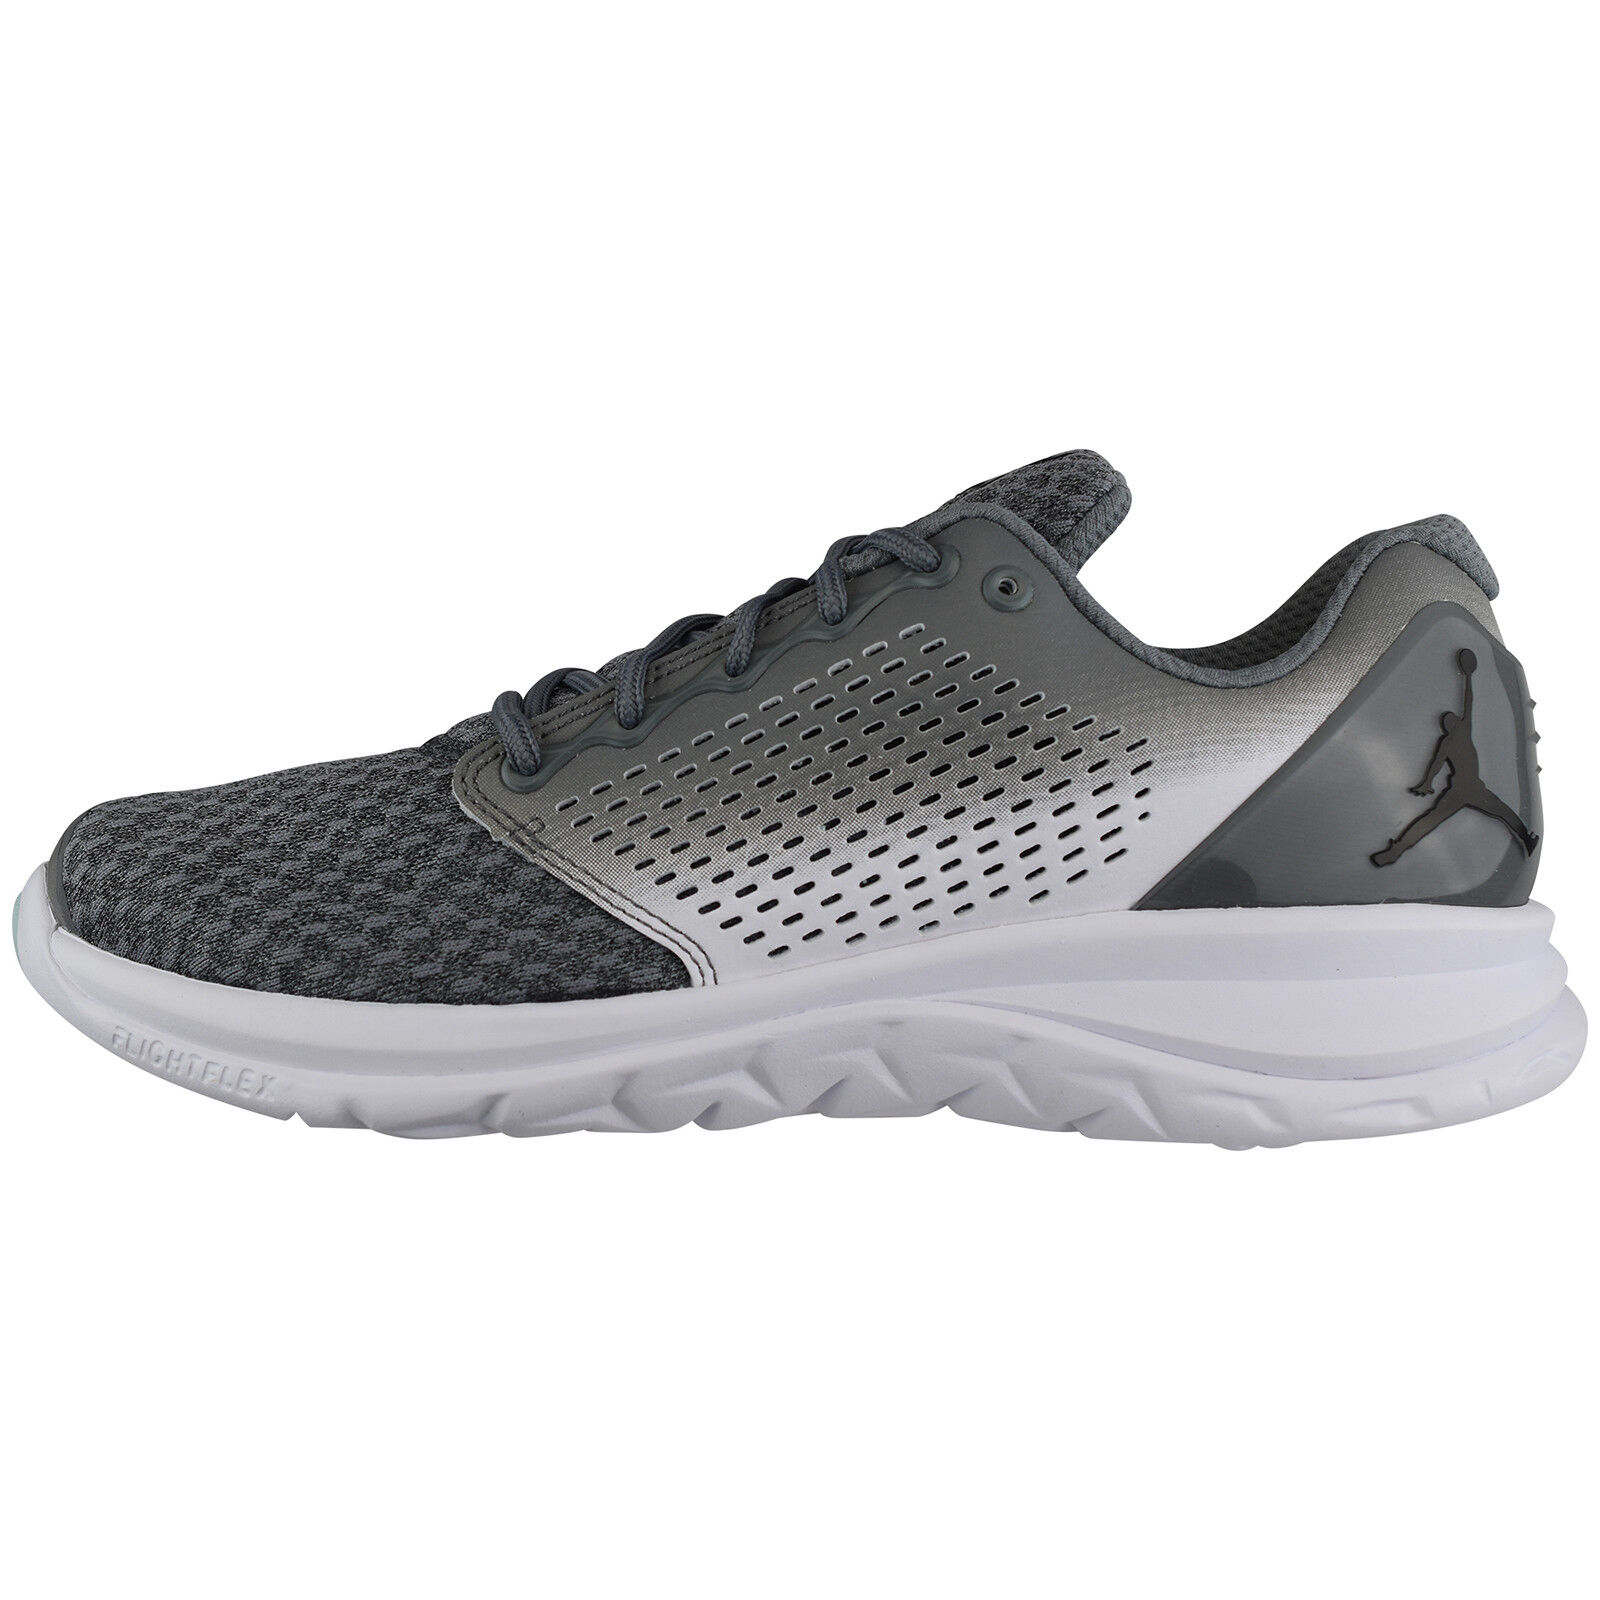 Nike Air Jordan Trainer ST WINTER 854562-002 Basketball Laufschuhe Sneaker